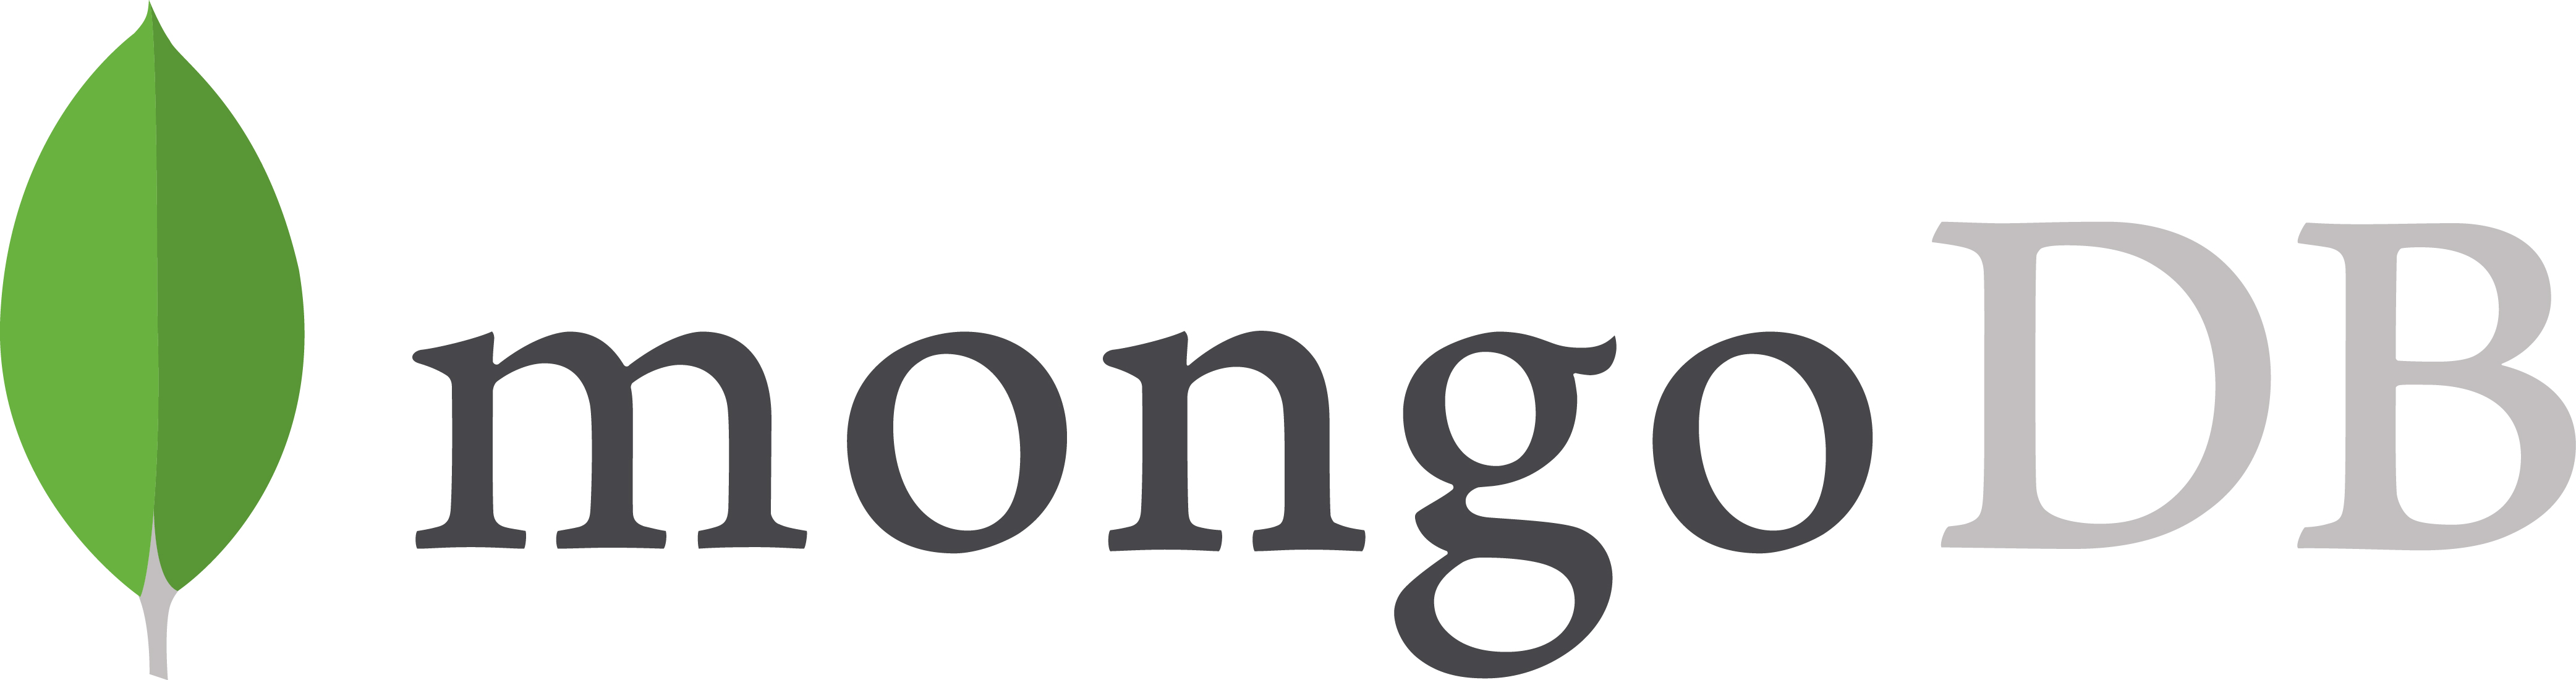 MongoDB ロゴ